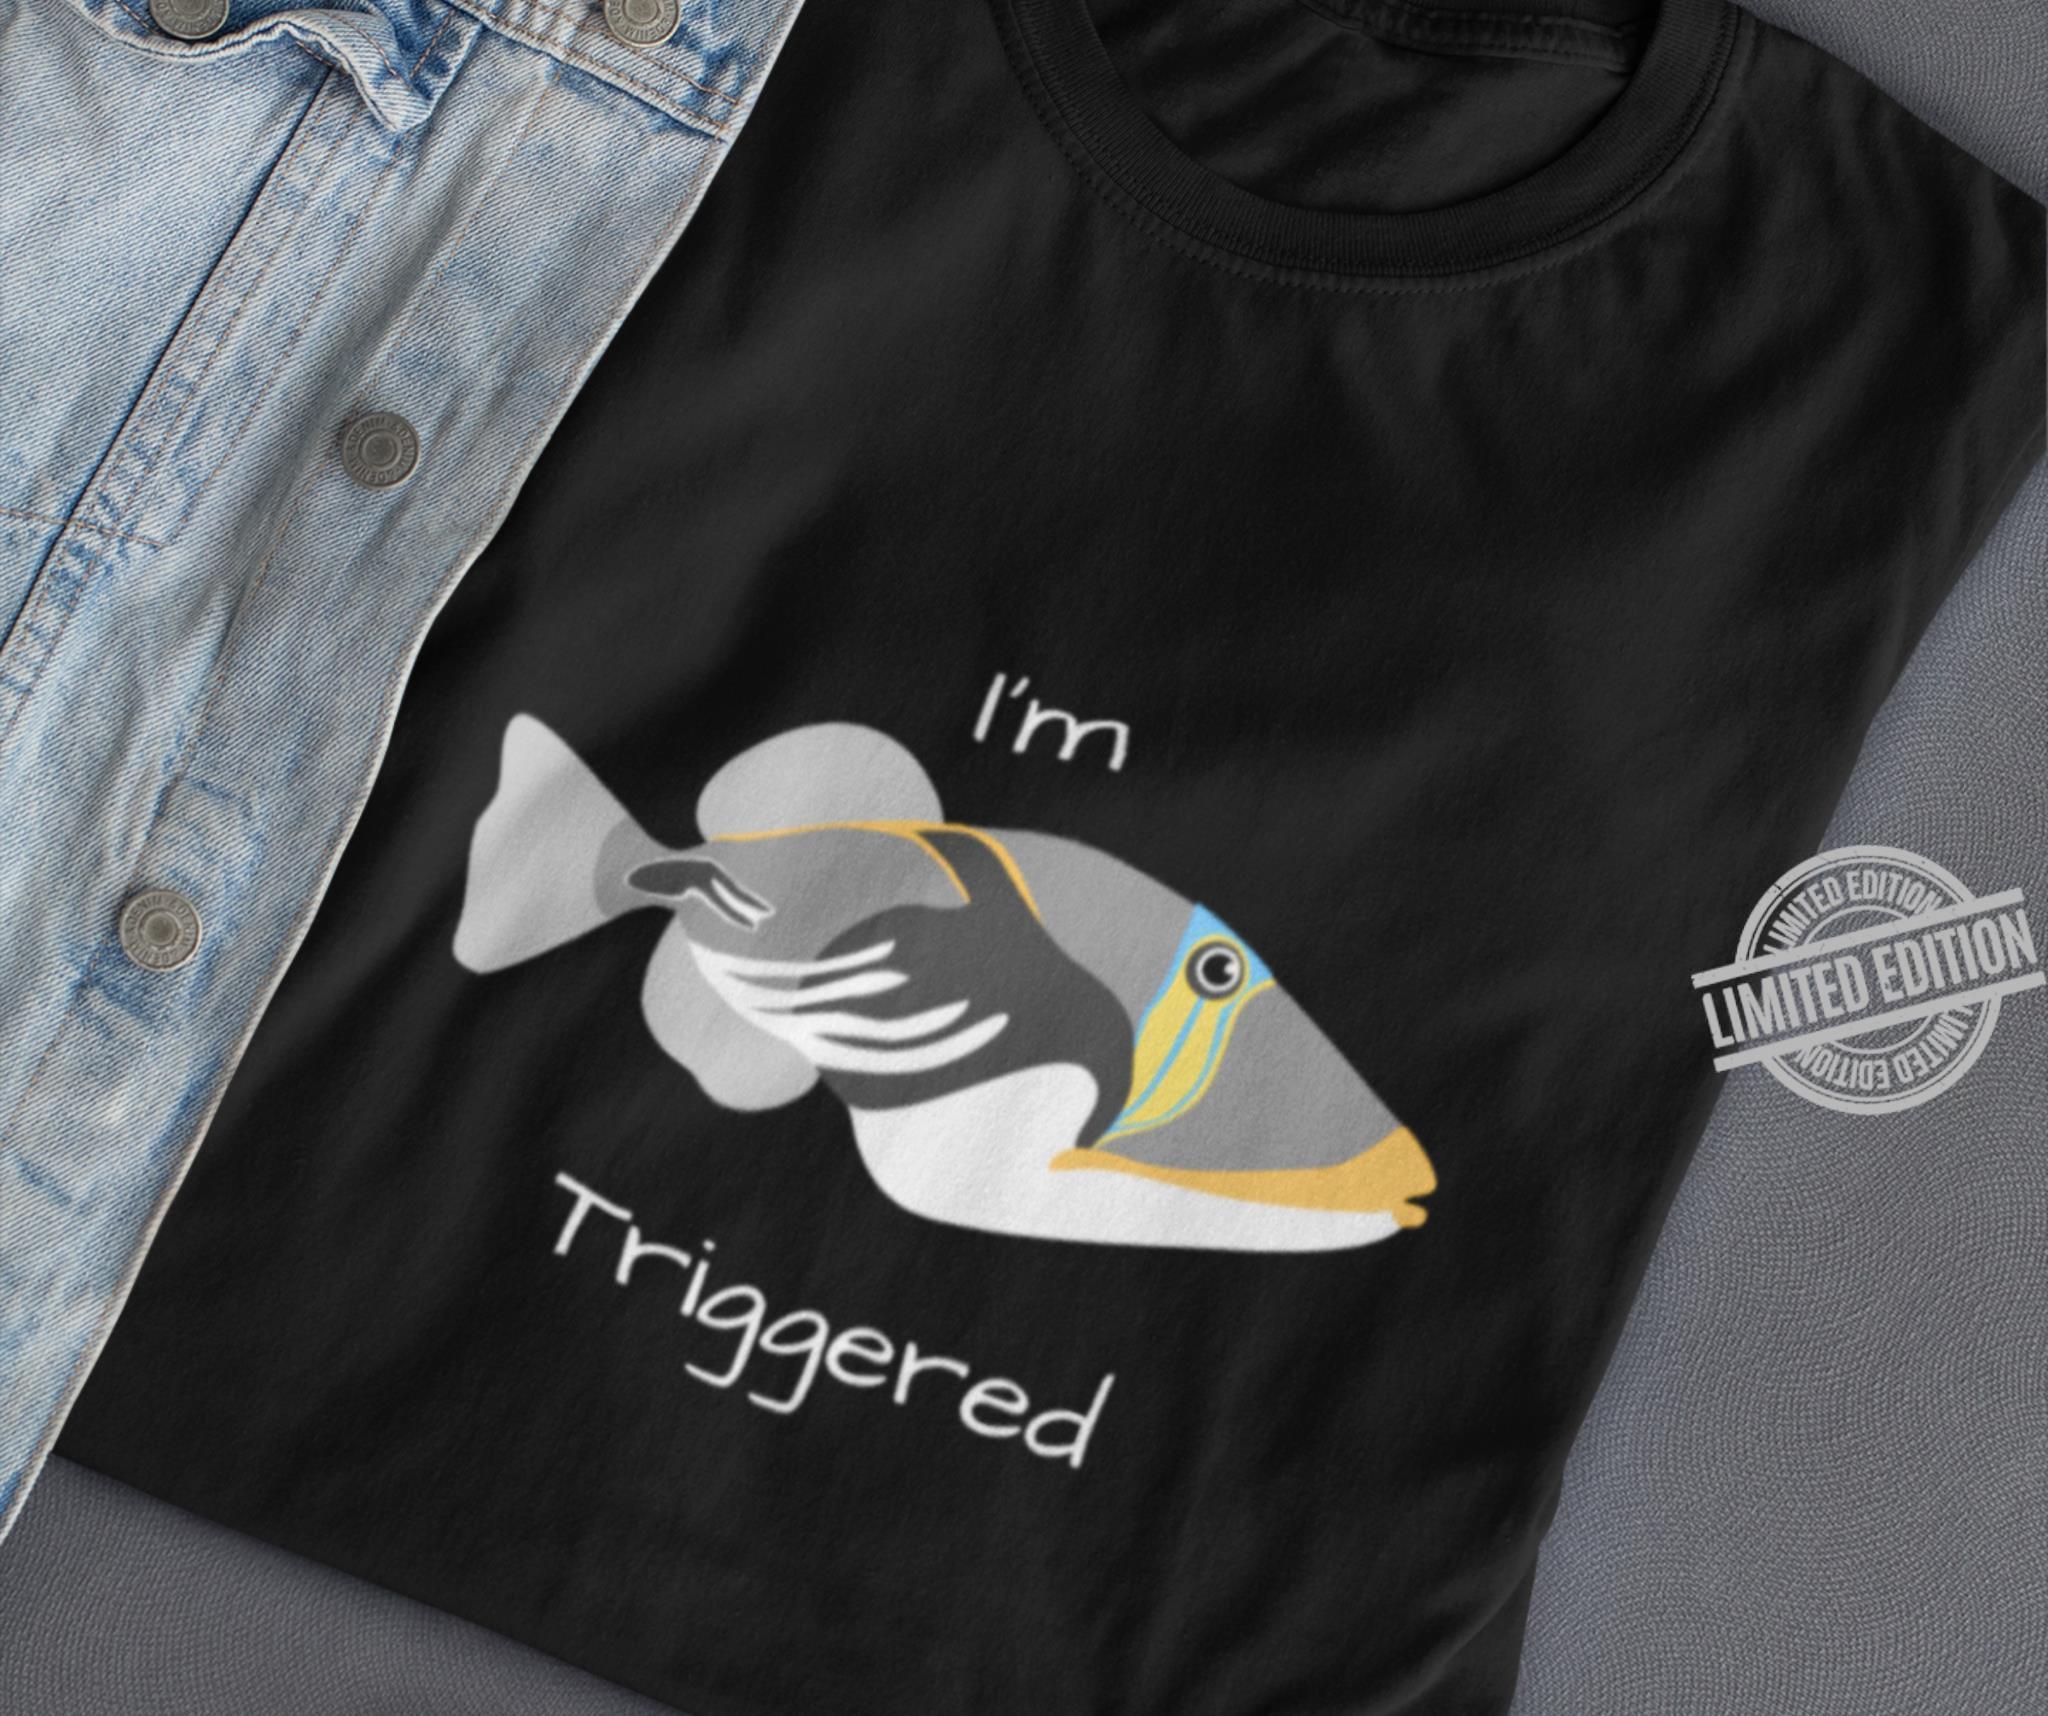 I'm A Fish Triggered Shirt